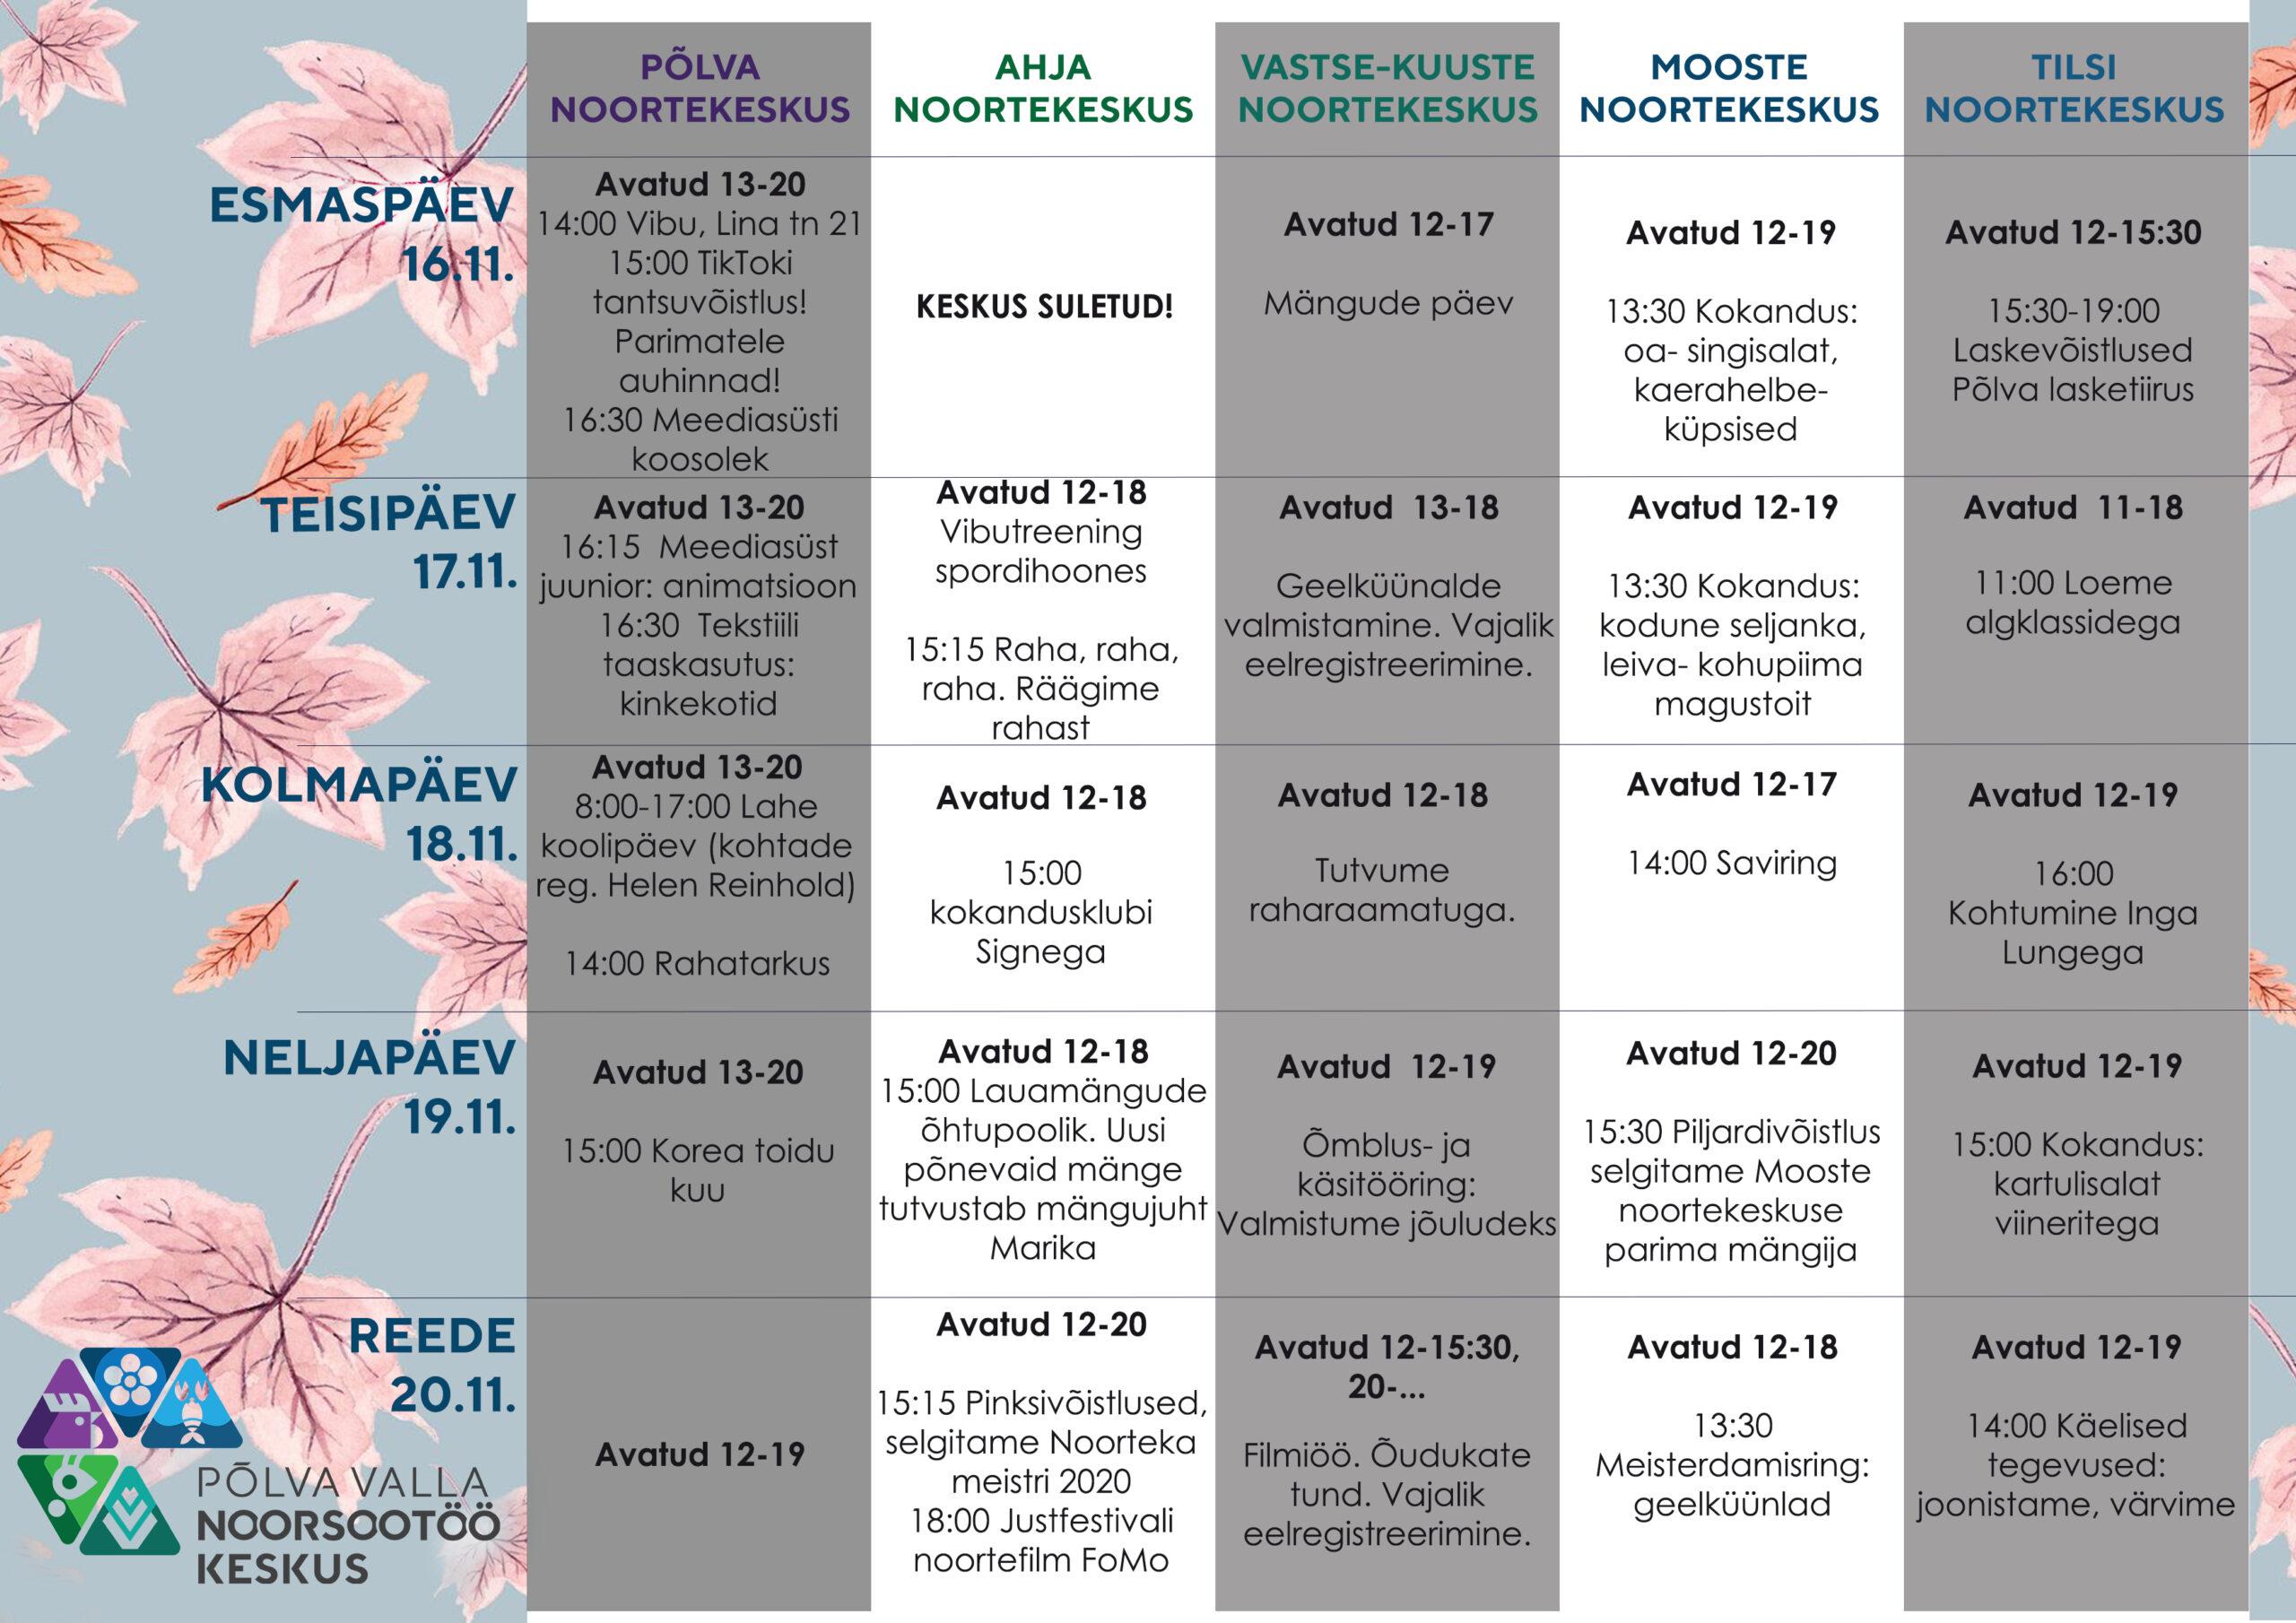 16.-20. november 2020 Põlva valla noortekeskustes